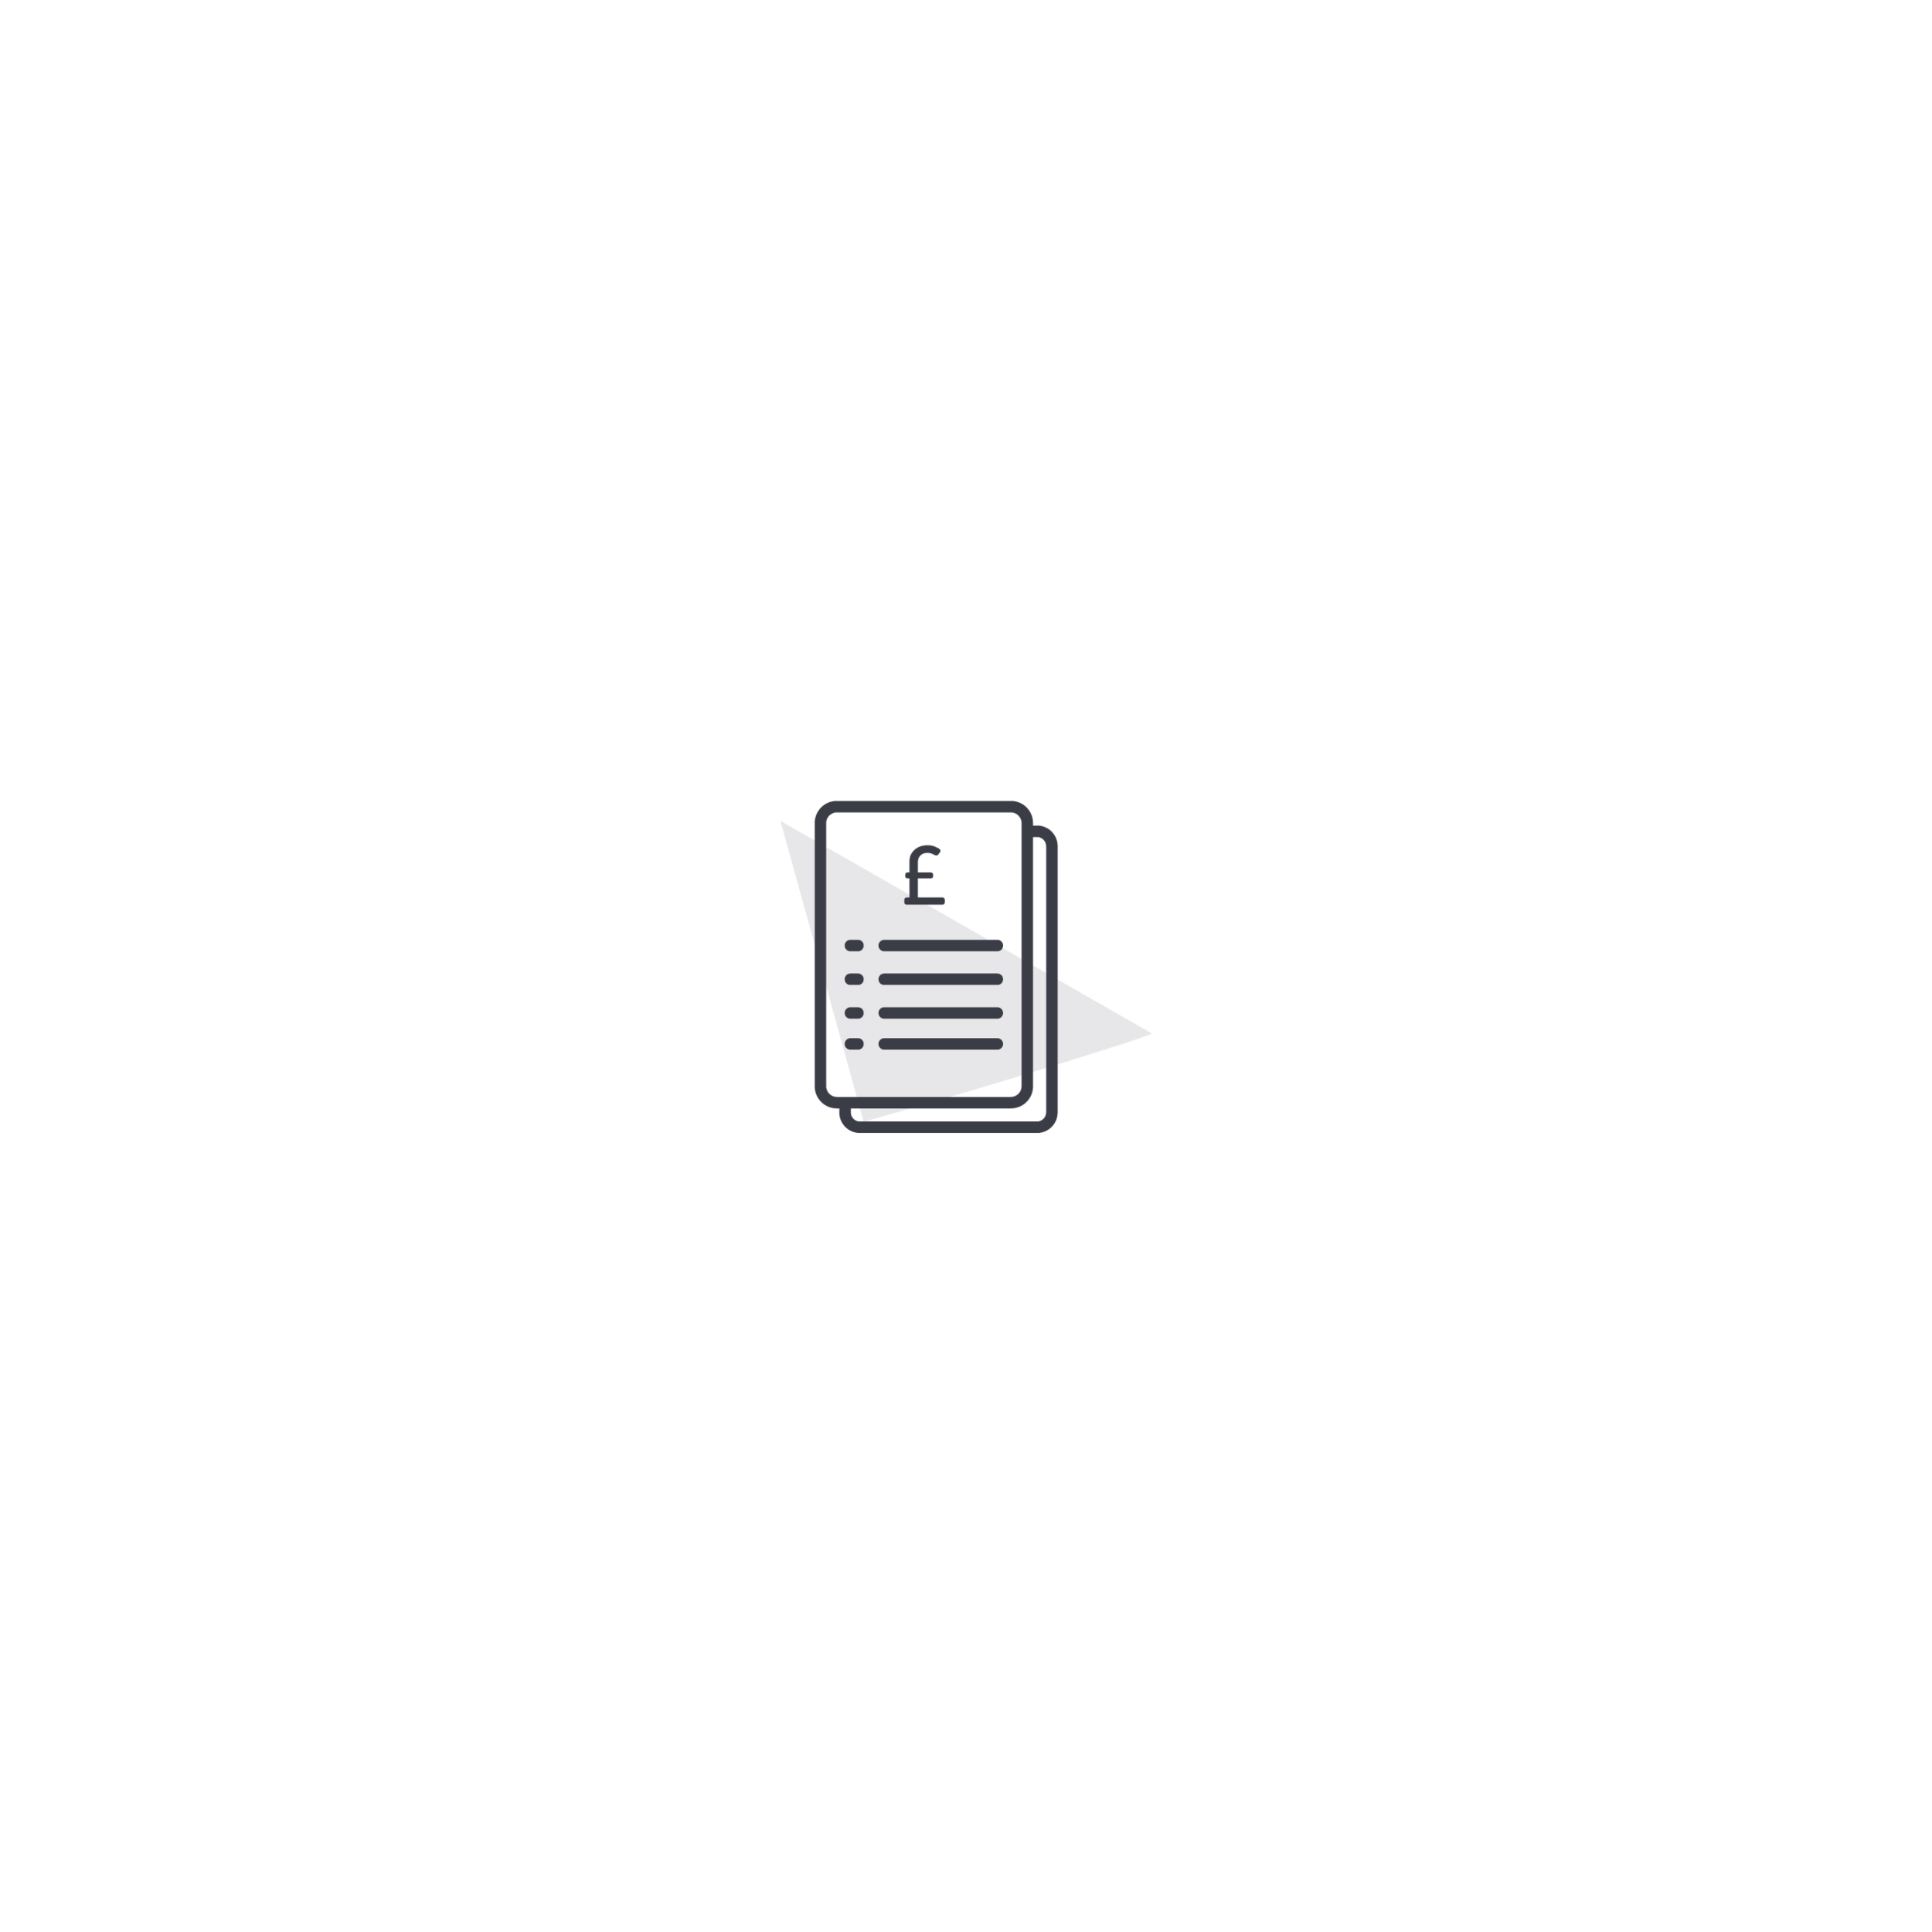 ae_Bill Validation Icon (Grey).png